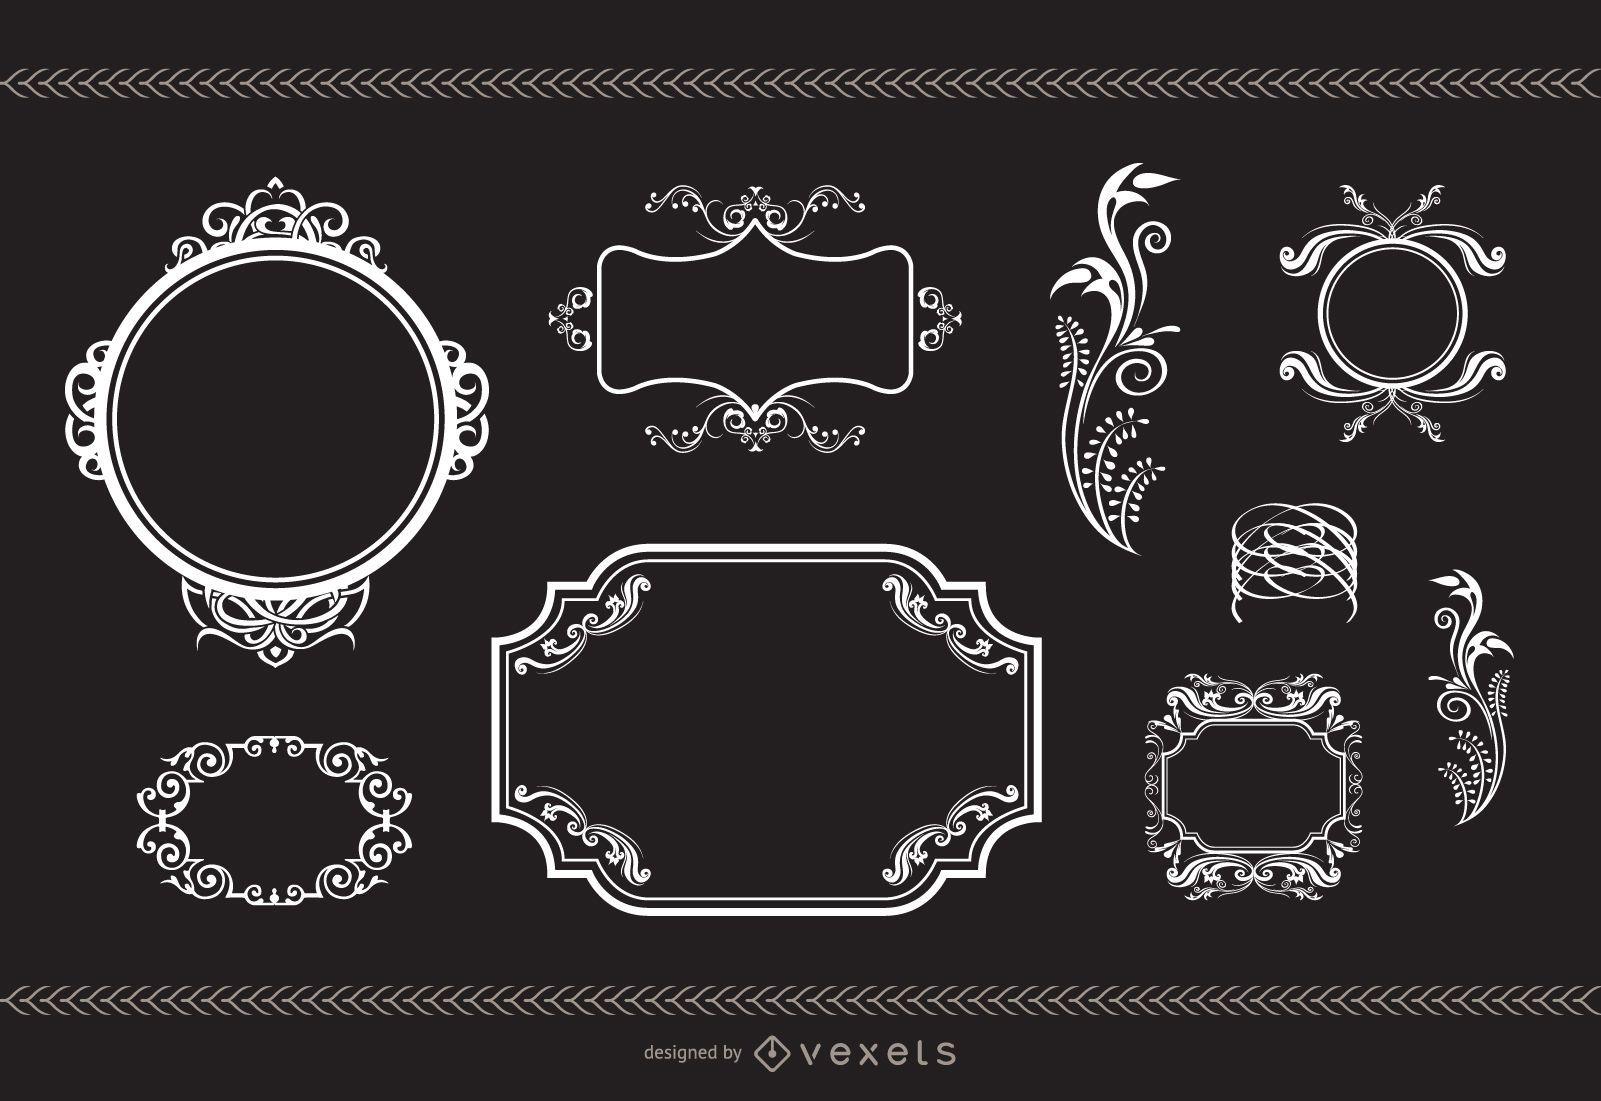 Heraldry and Flourish Frames